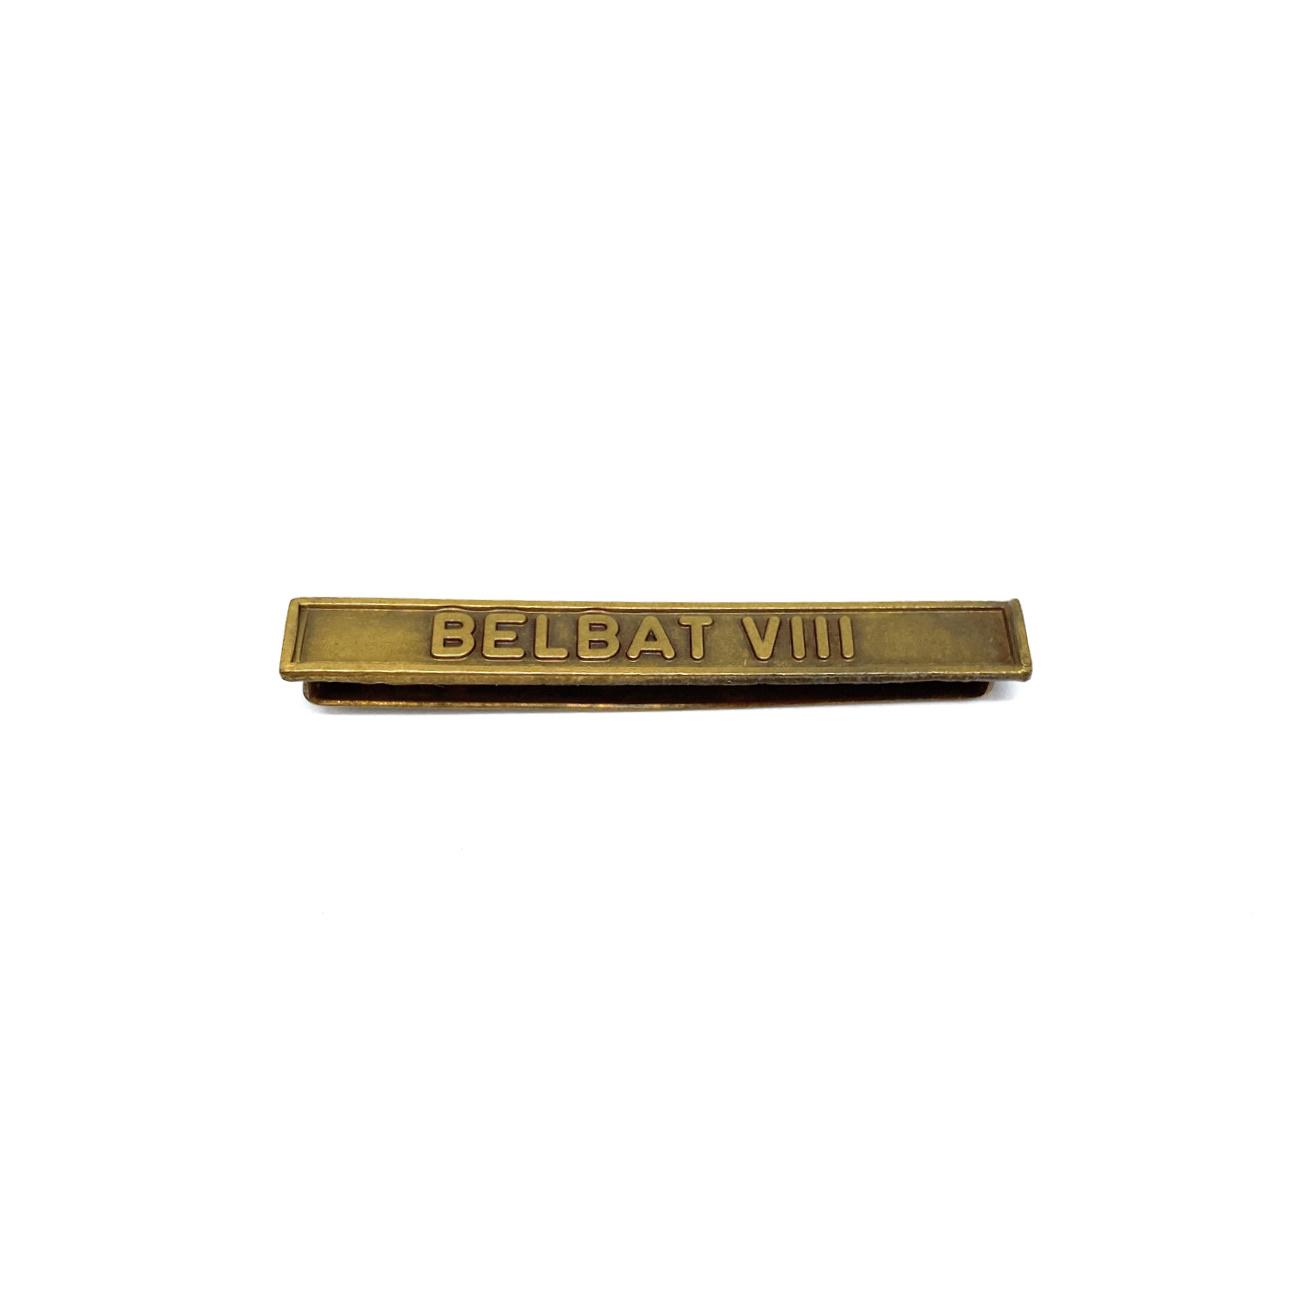 Bar Belbat VIII for military medals